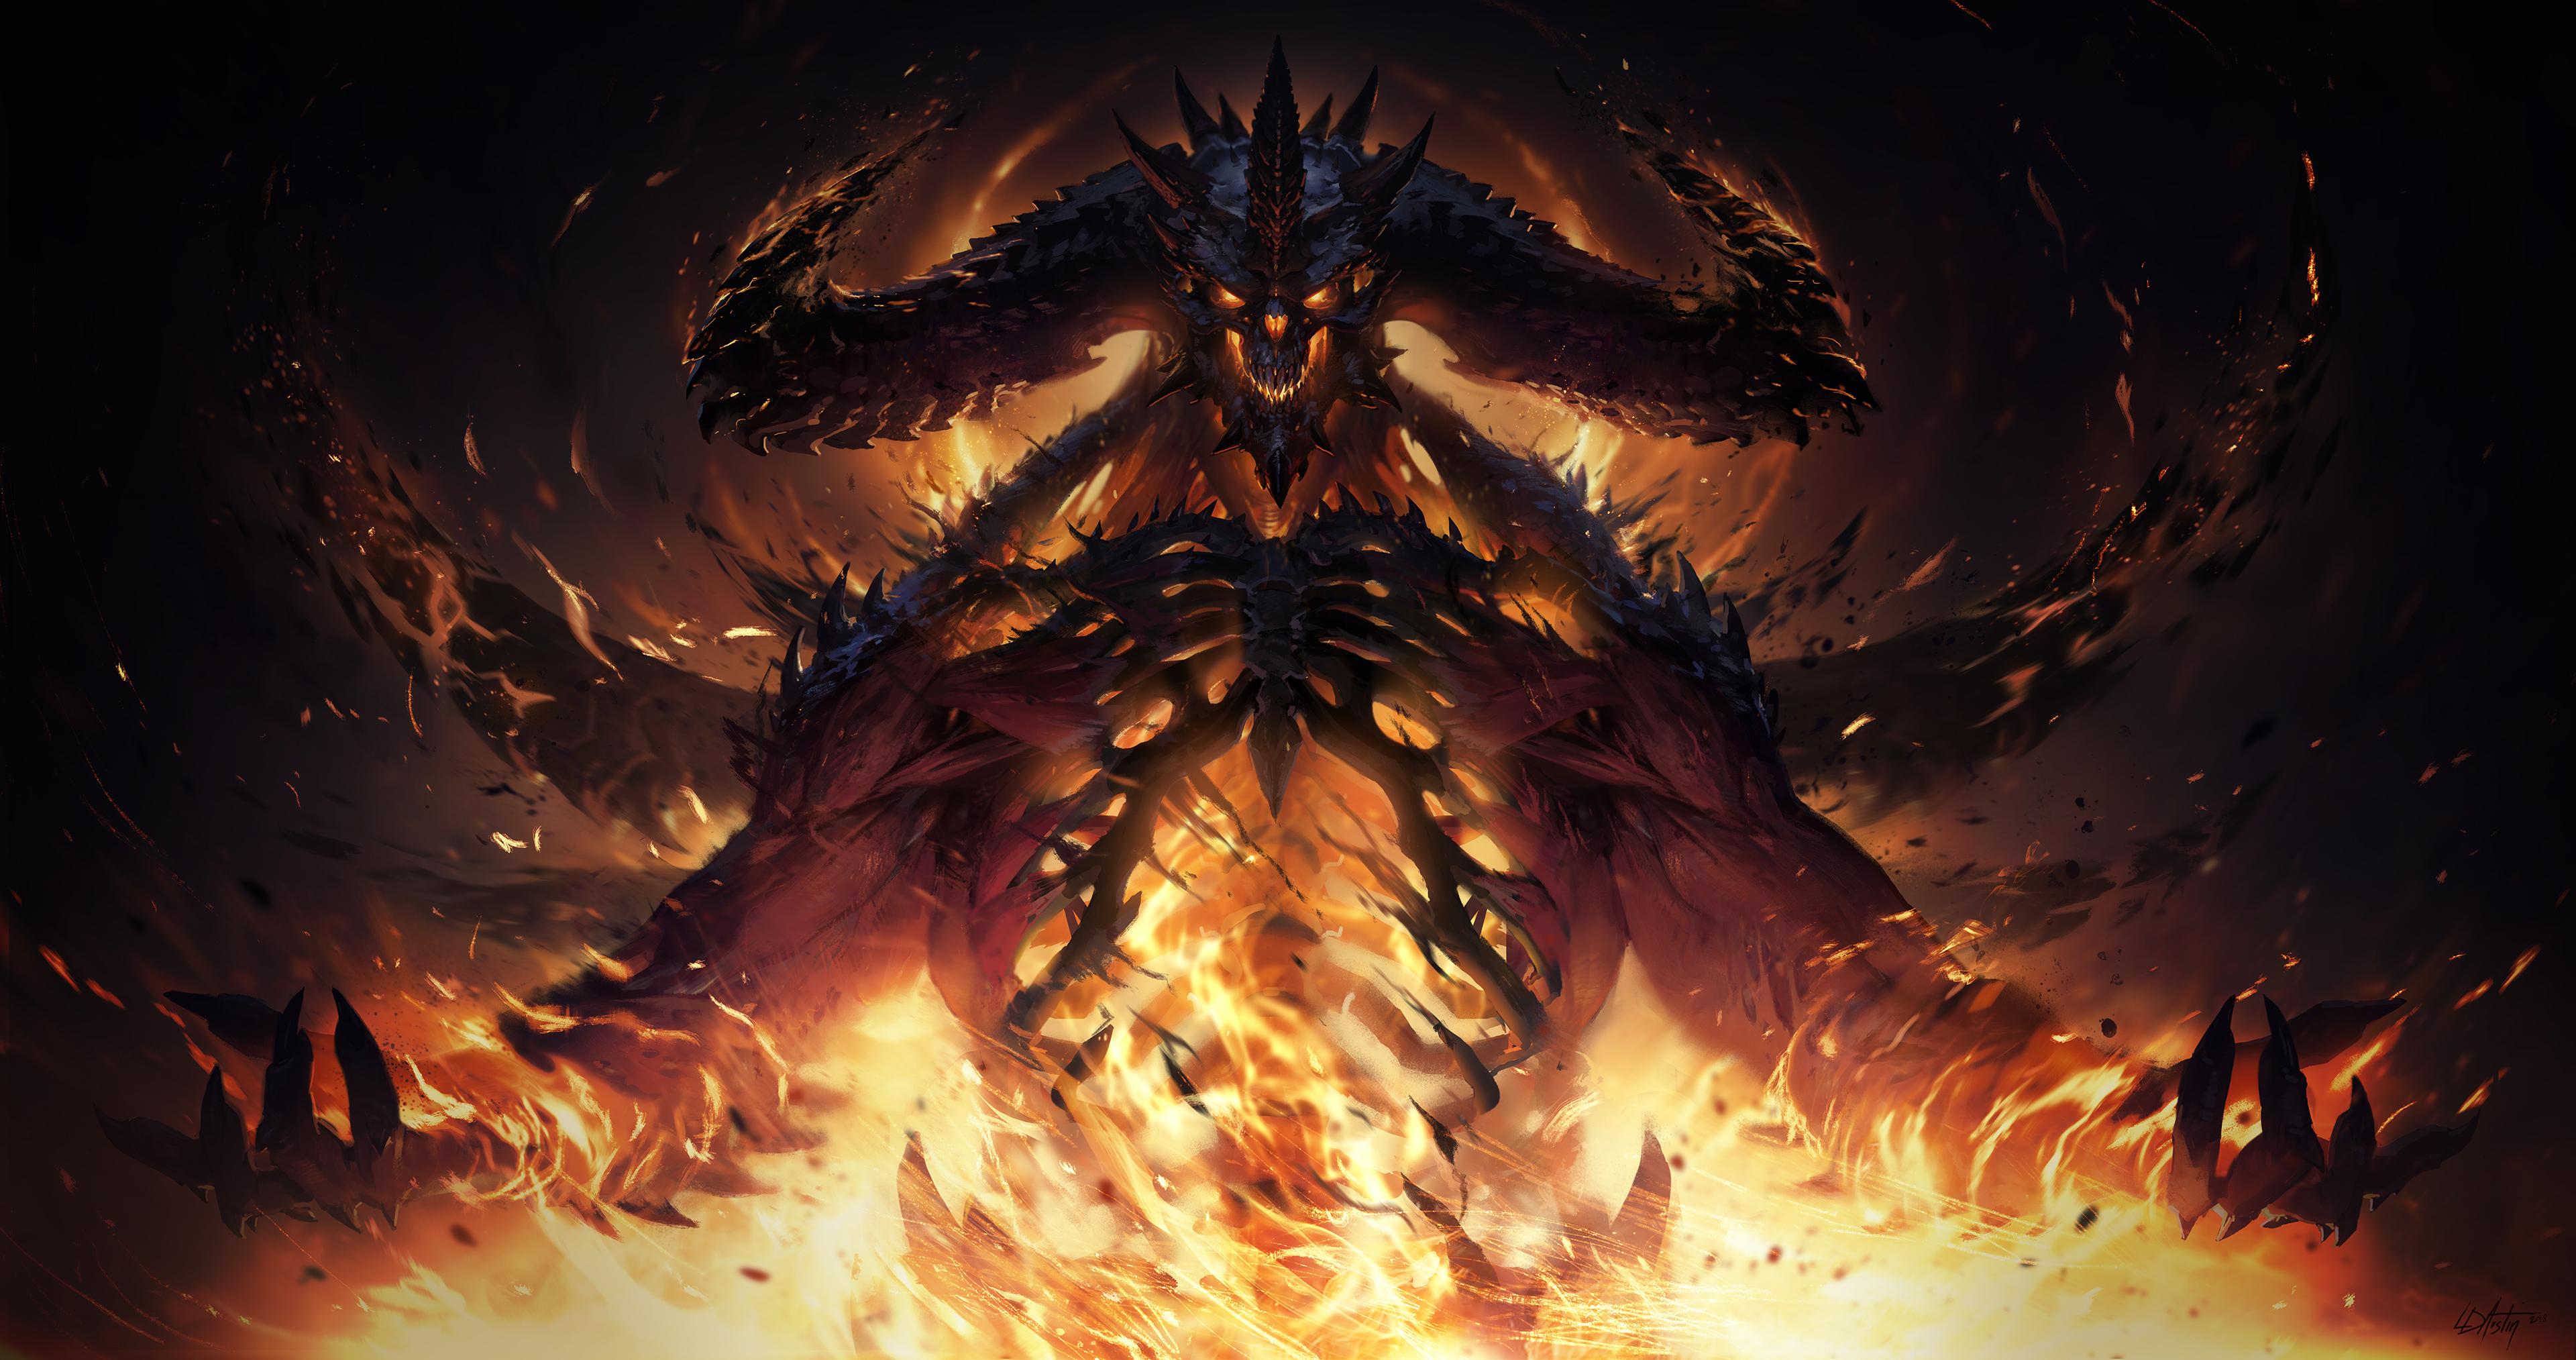 Diablo Immortal Wallpaper Hd Games 4k Wallpapers Images